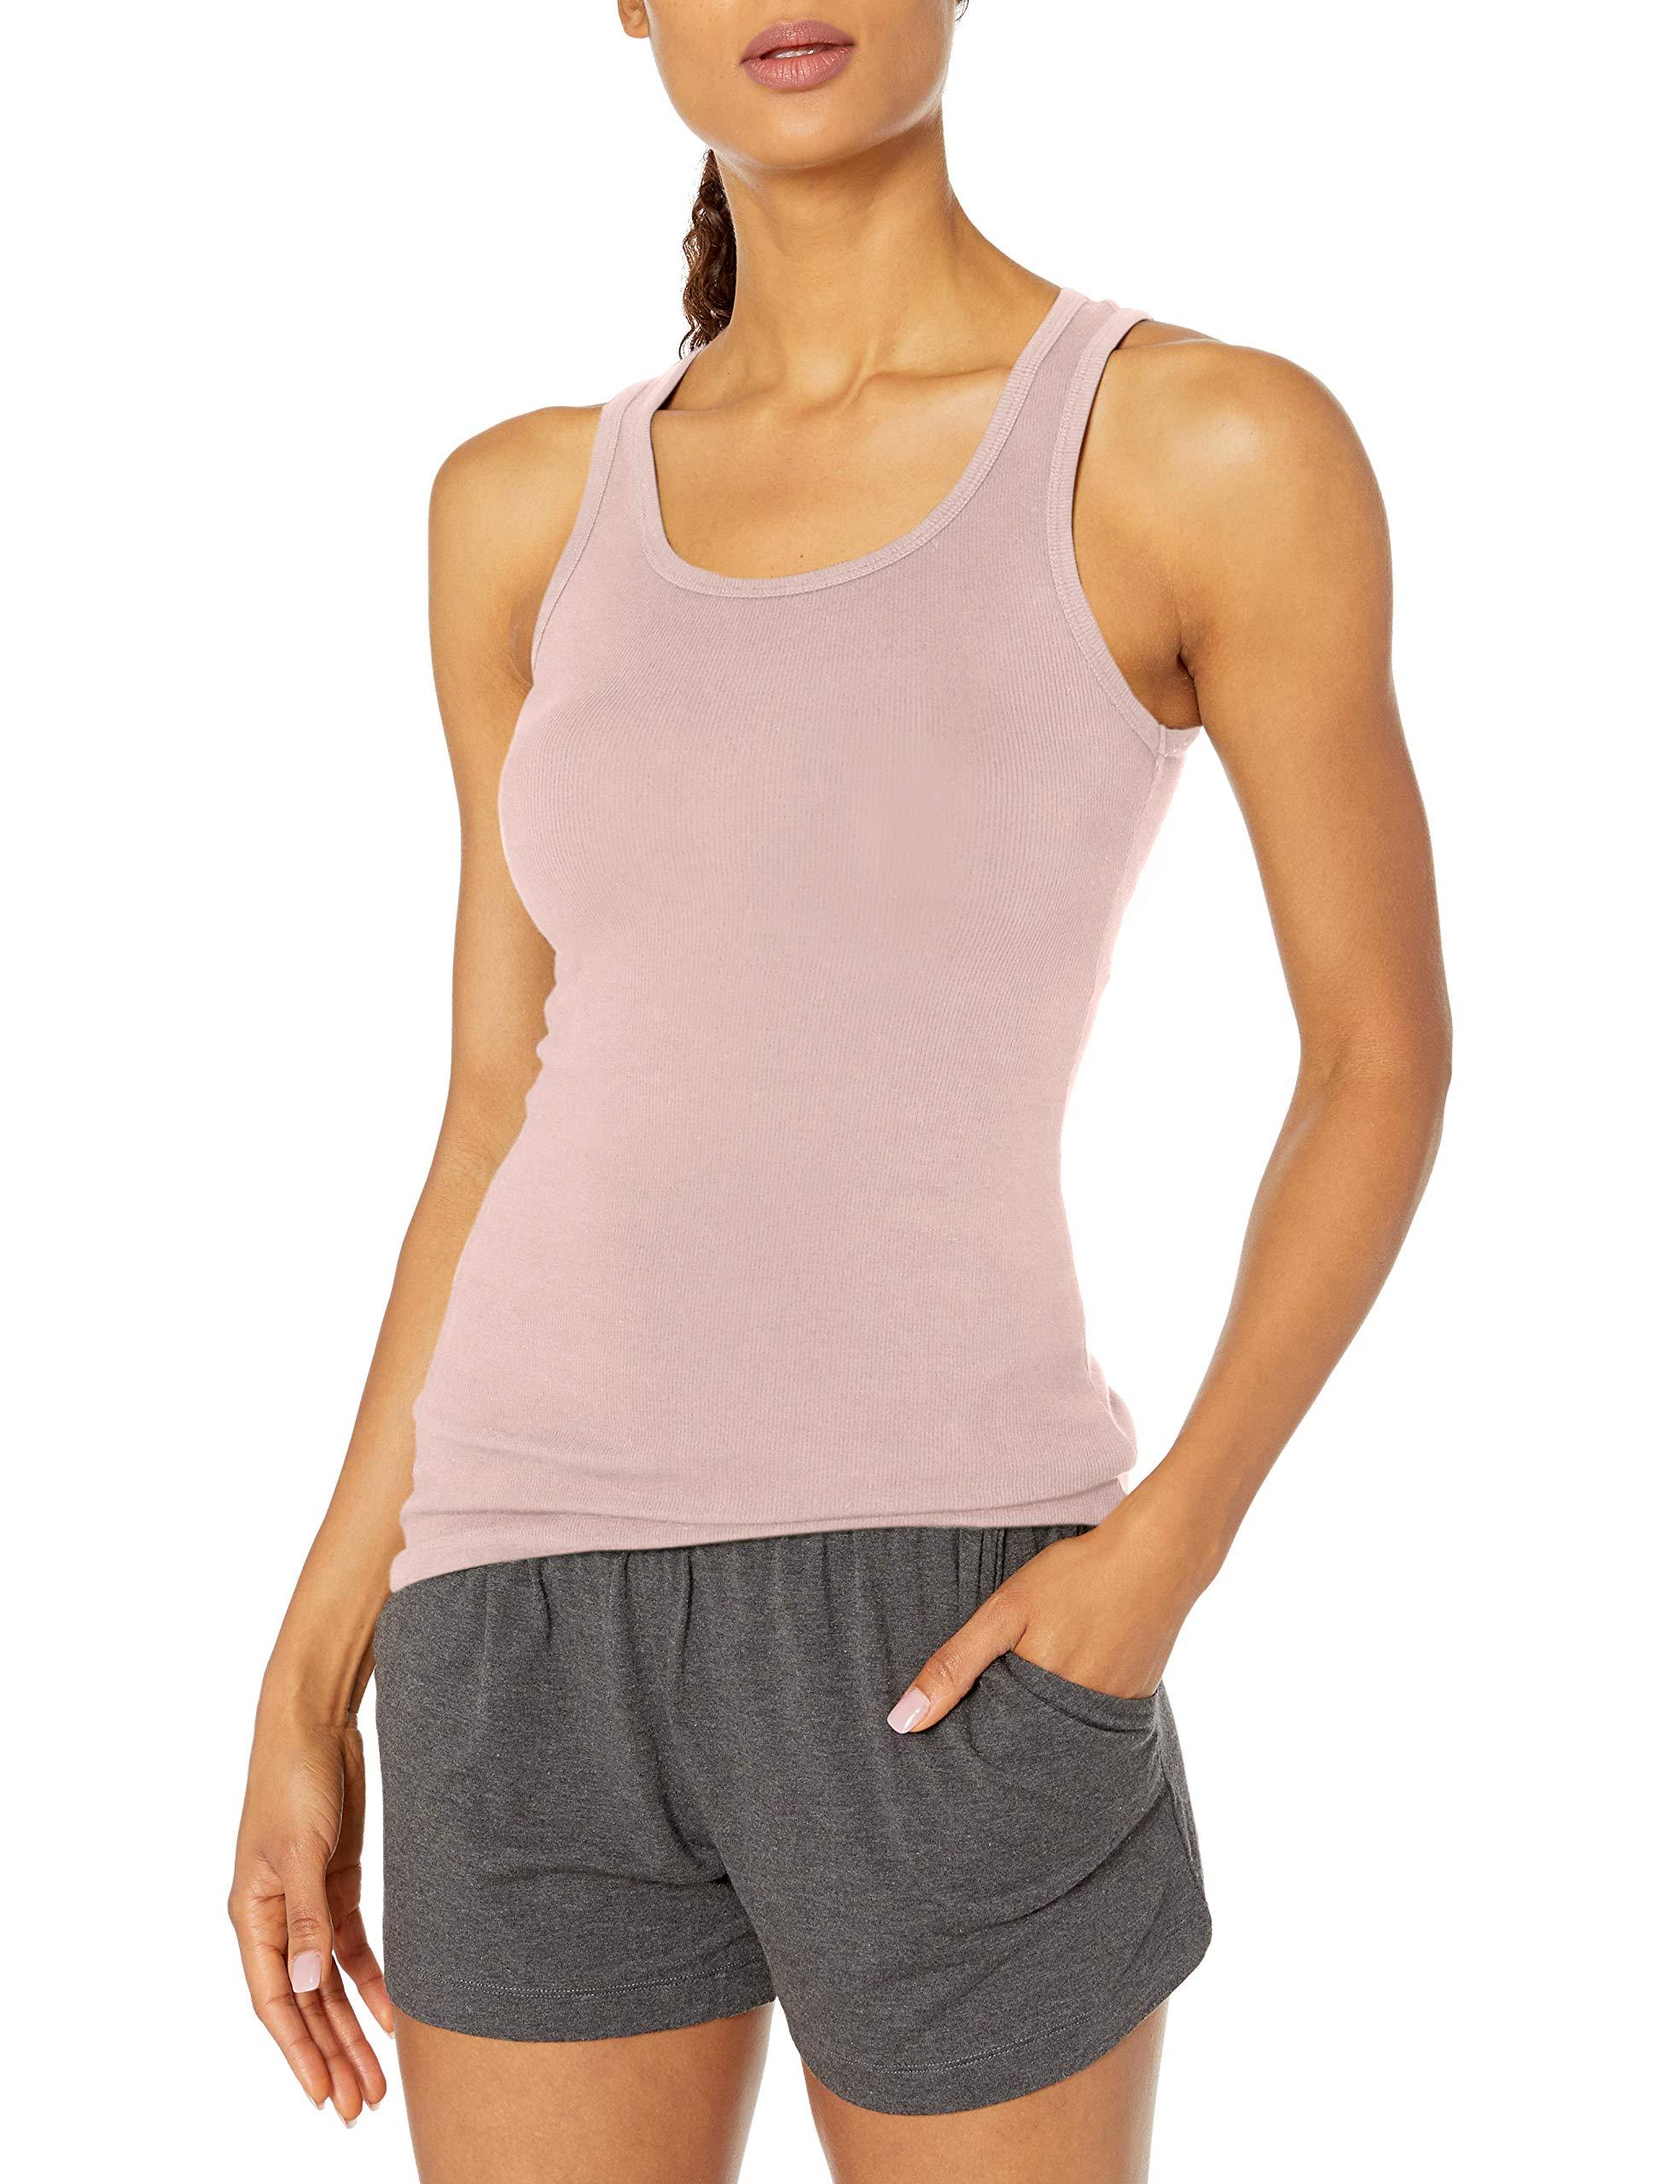 Bra30 Women's Tummy Tucker, Pink, Medium